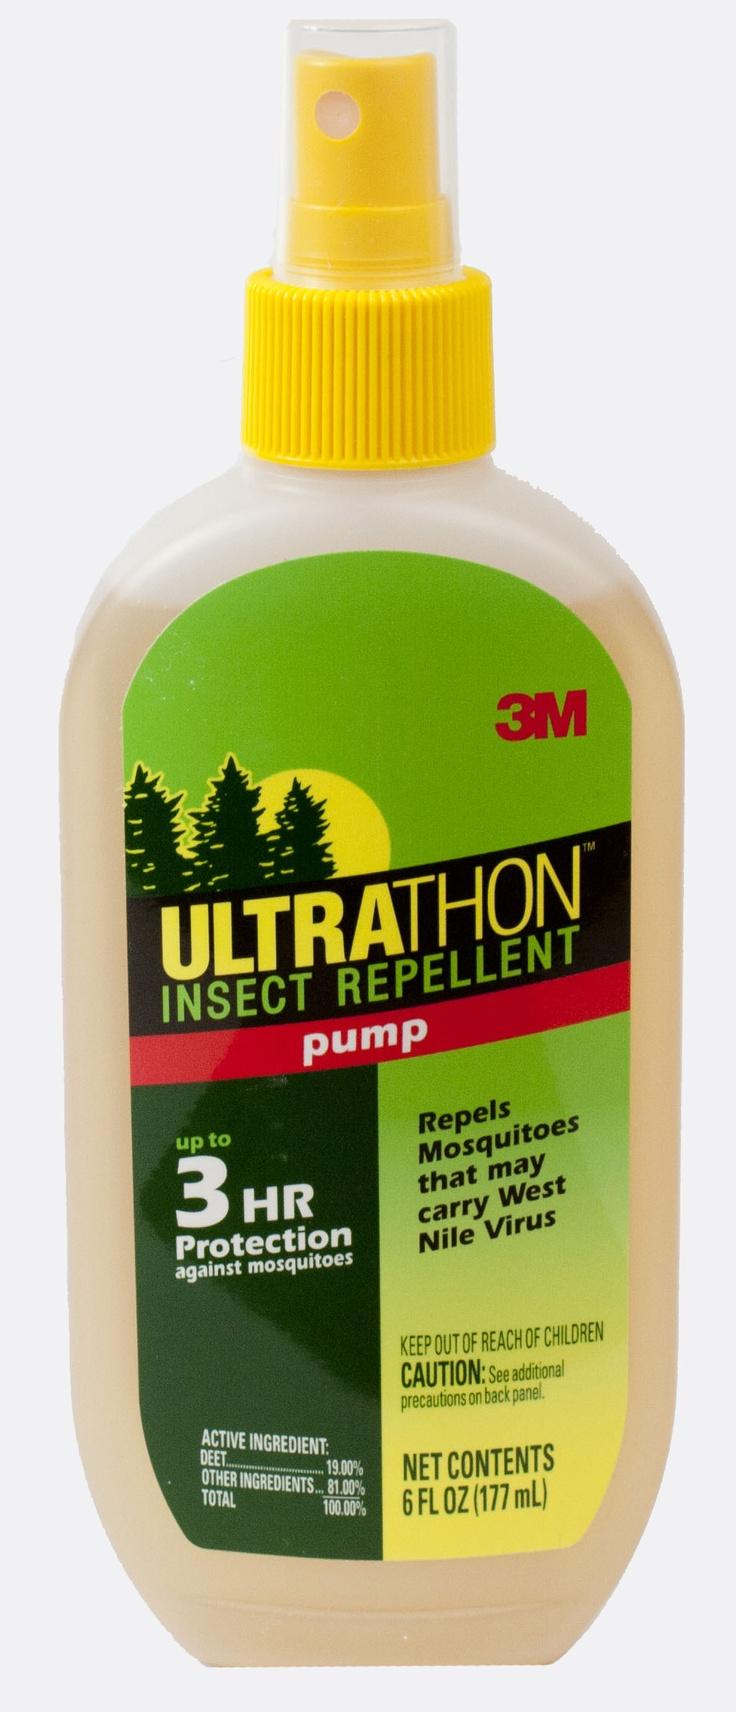 Ultrathon Insect Repellent, 6 oz. spray pump of Deet insect repellent.